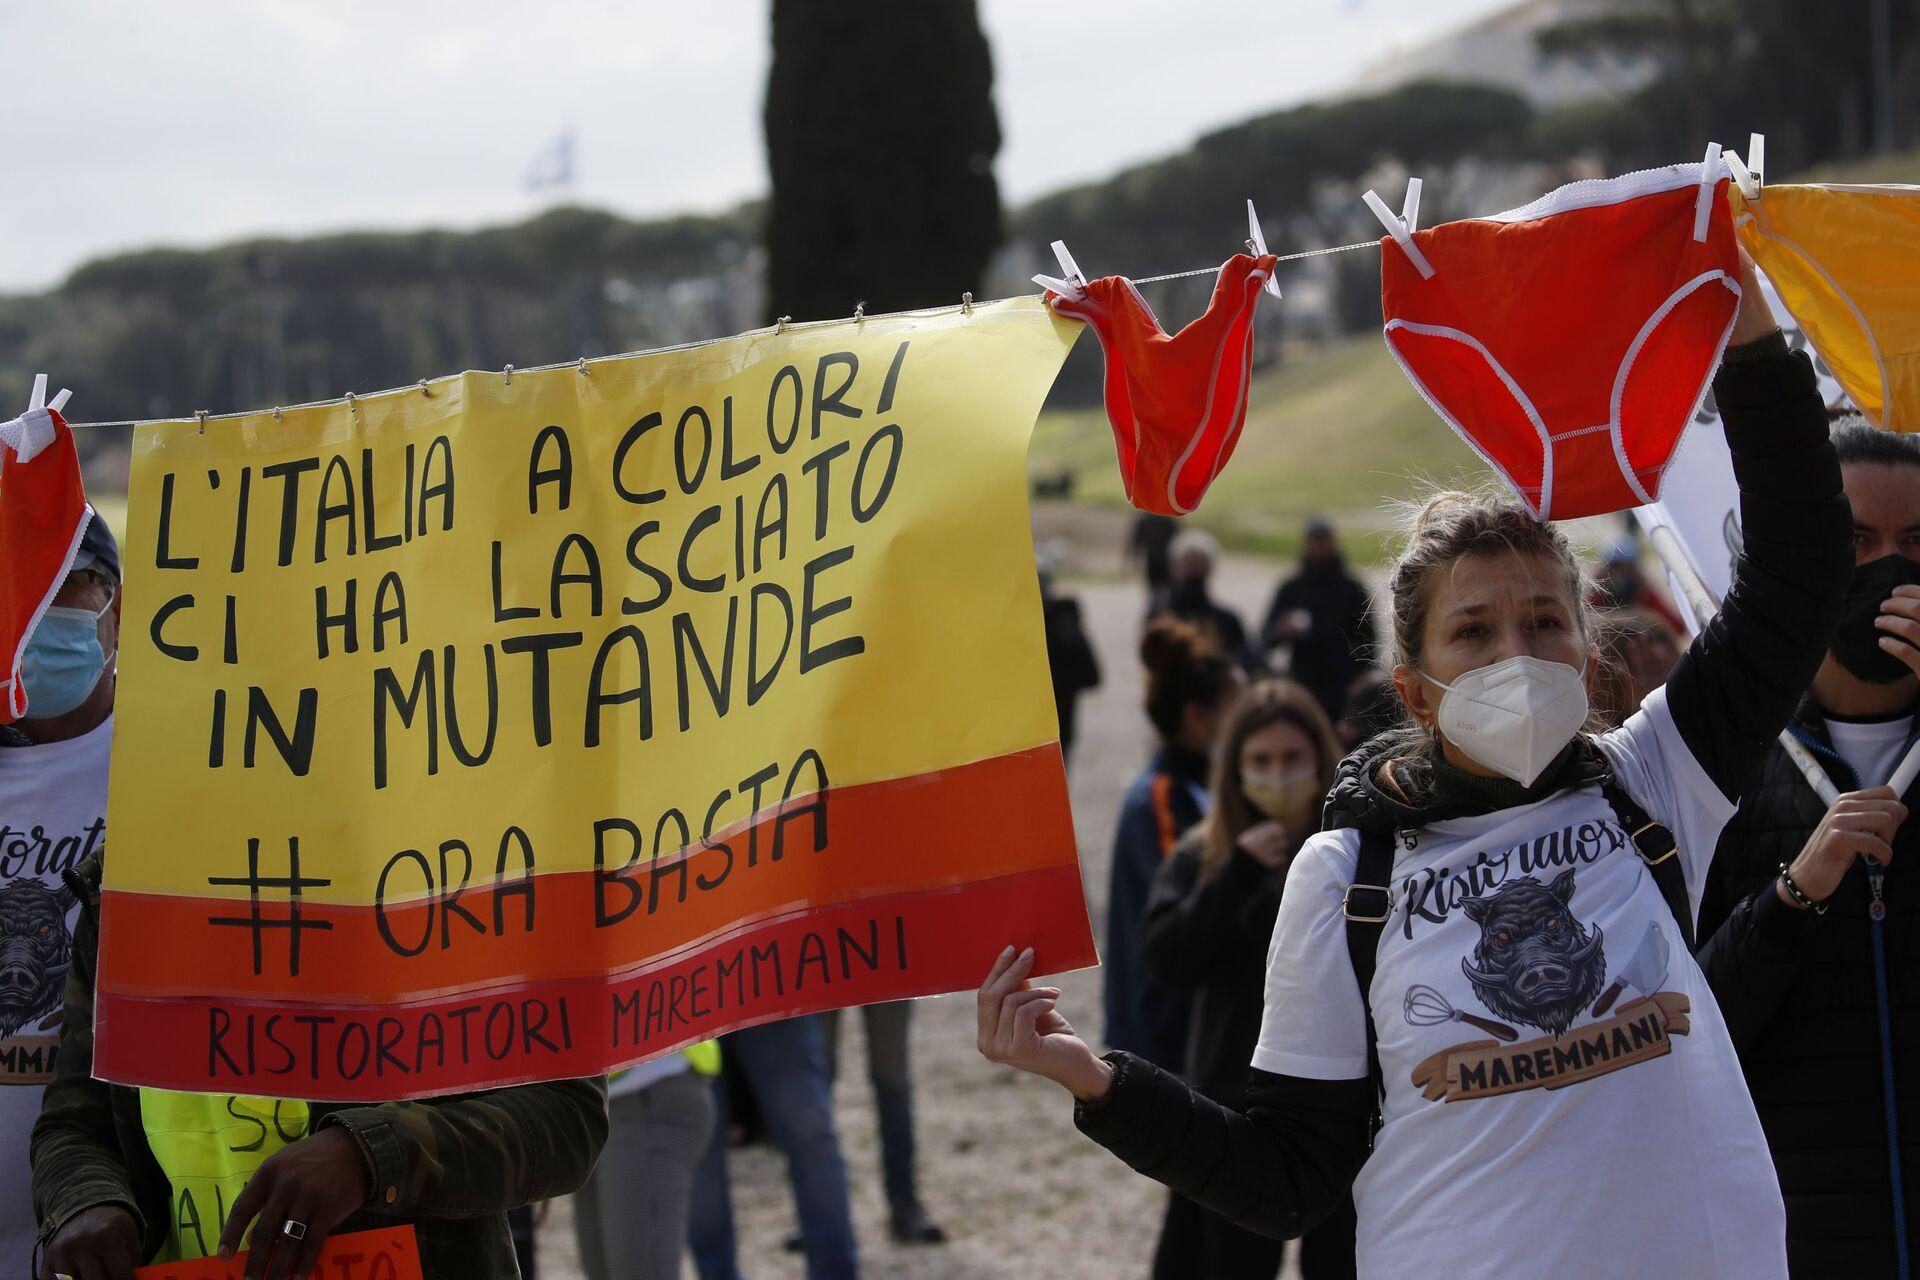 Proteste dei ristoratori a Roma, 13 aprile 2021 - Sputnik Italia, 1920, 18.05.2021